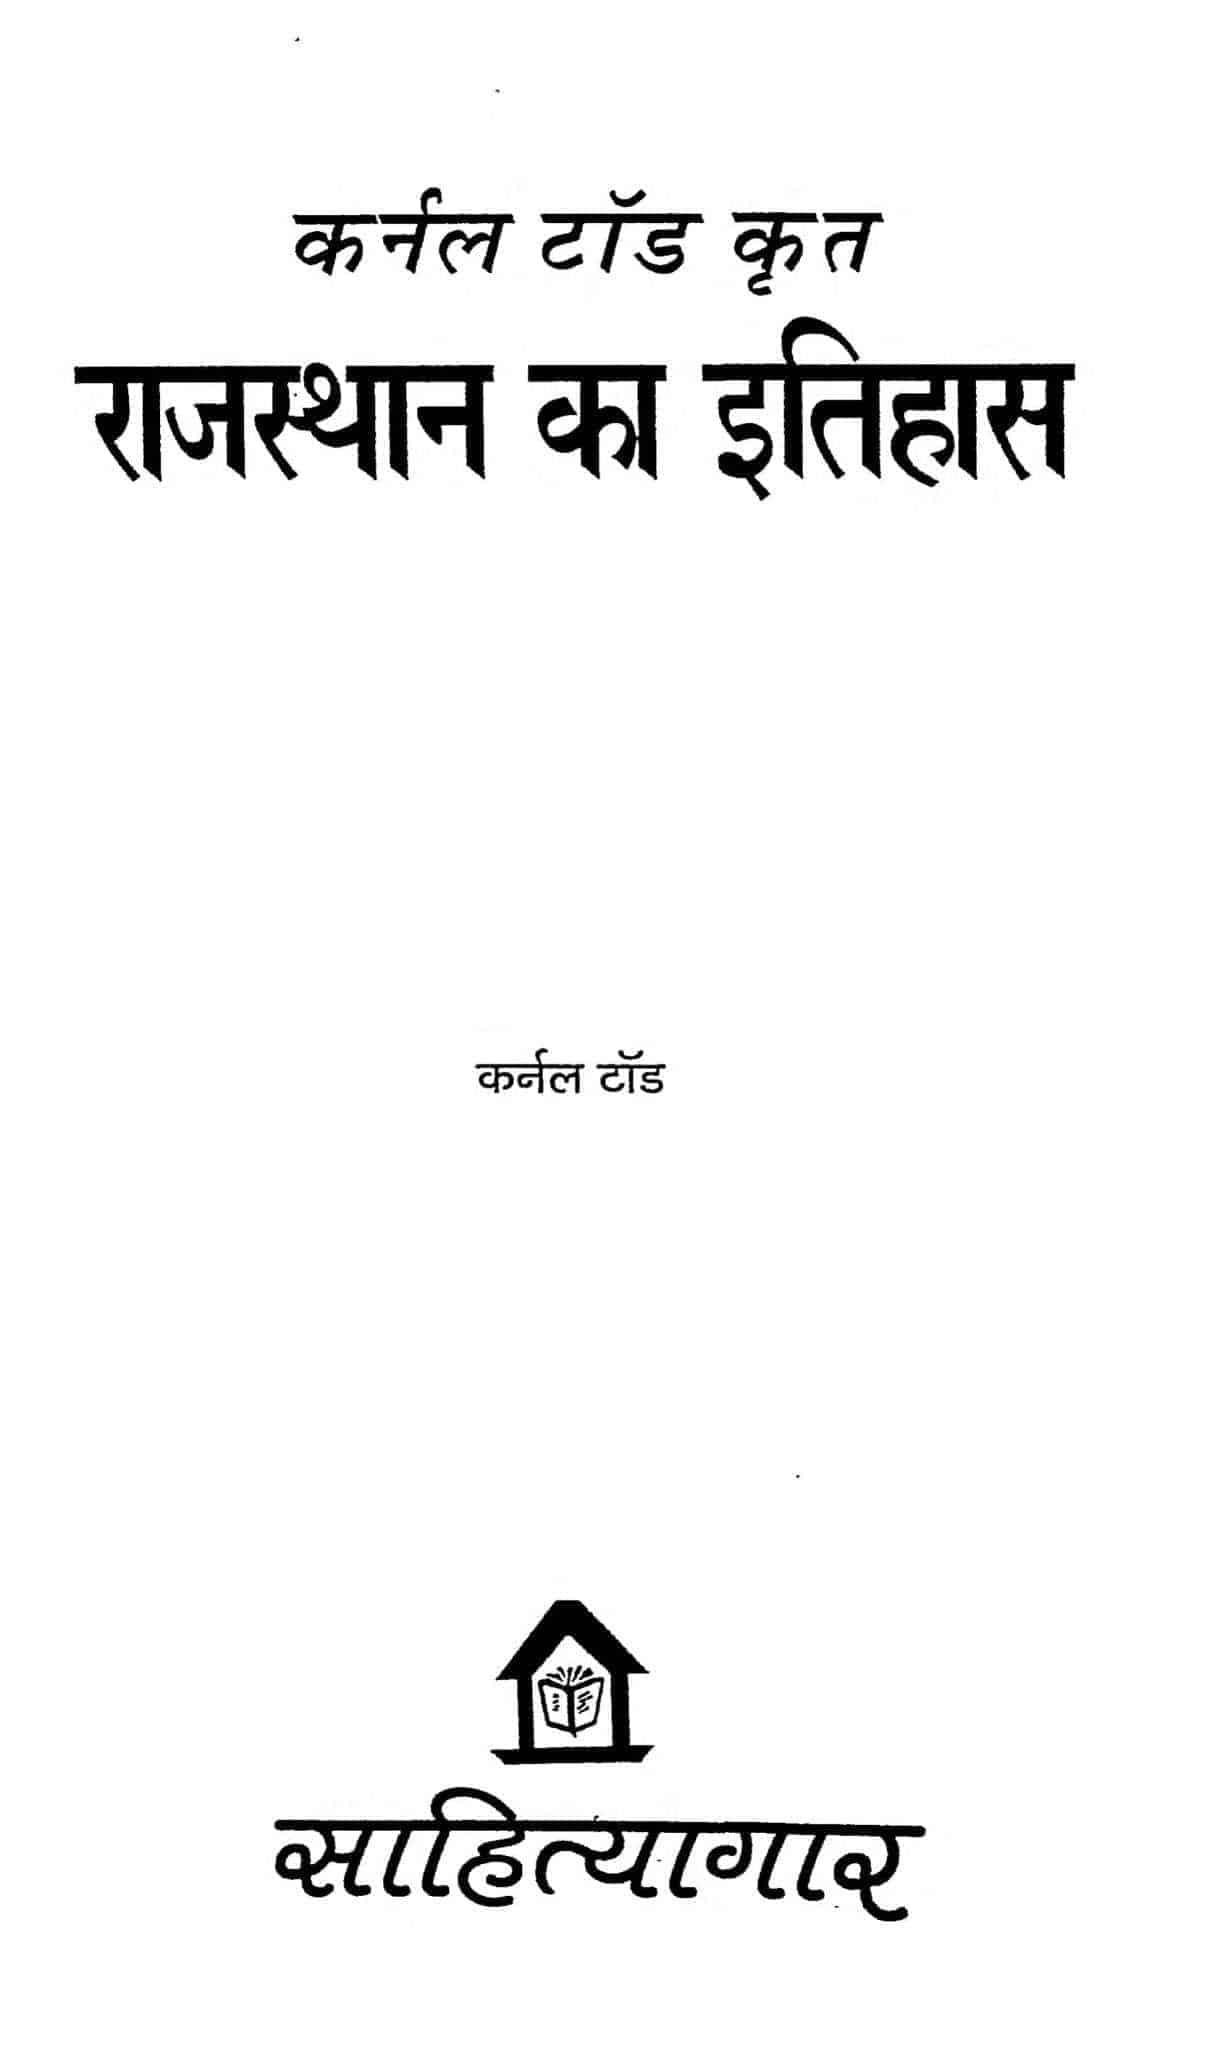 Book Image : राजस्थान का इतिहास  - Rajasthan Ka Itihas